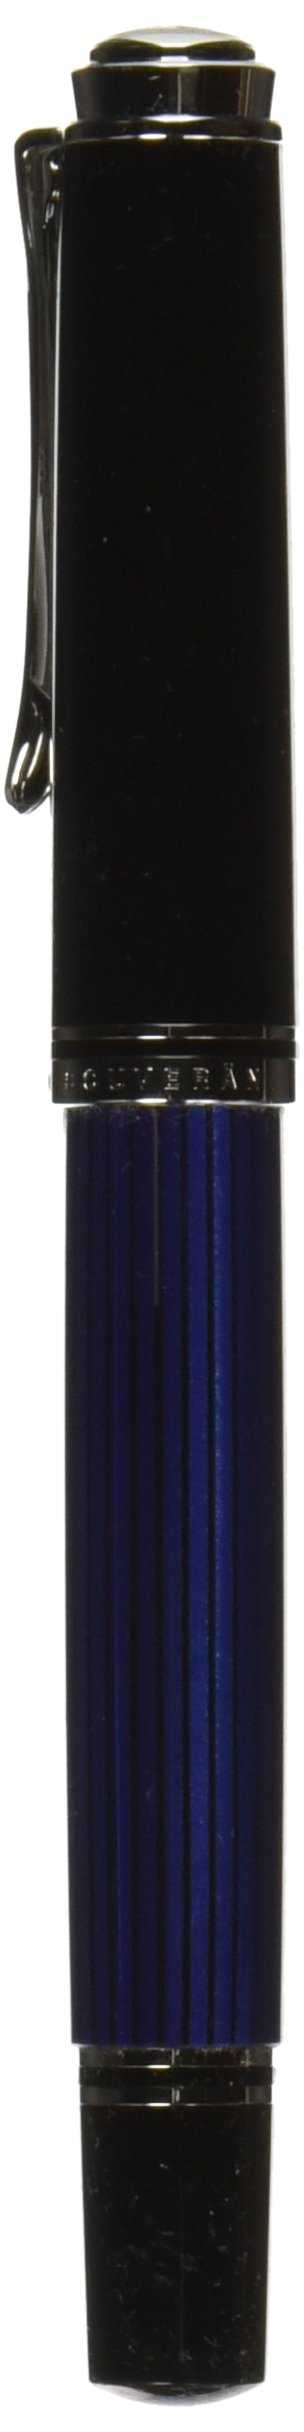 PELIKAN Souveran Fountain Pen Fine, Black/Blue (932814)